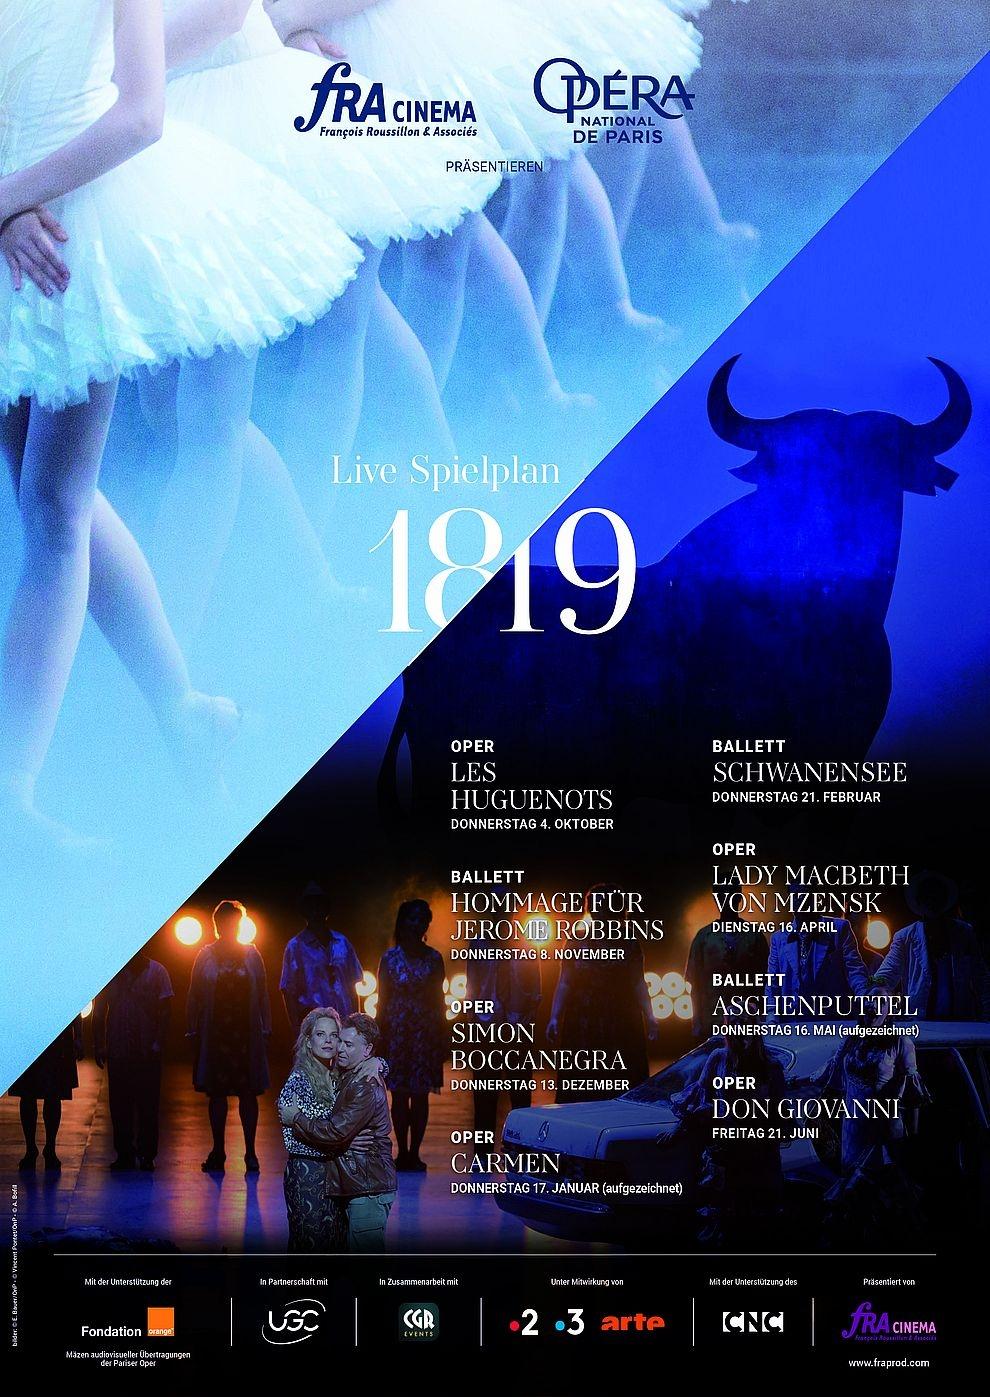 Opéra national de Paris 2018/19: Don Giovanni (Poster)